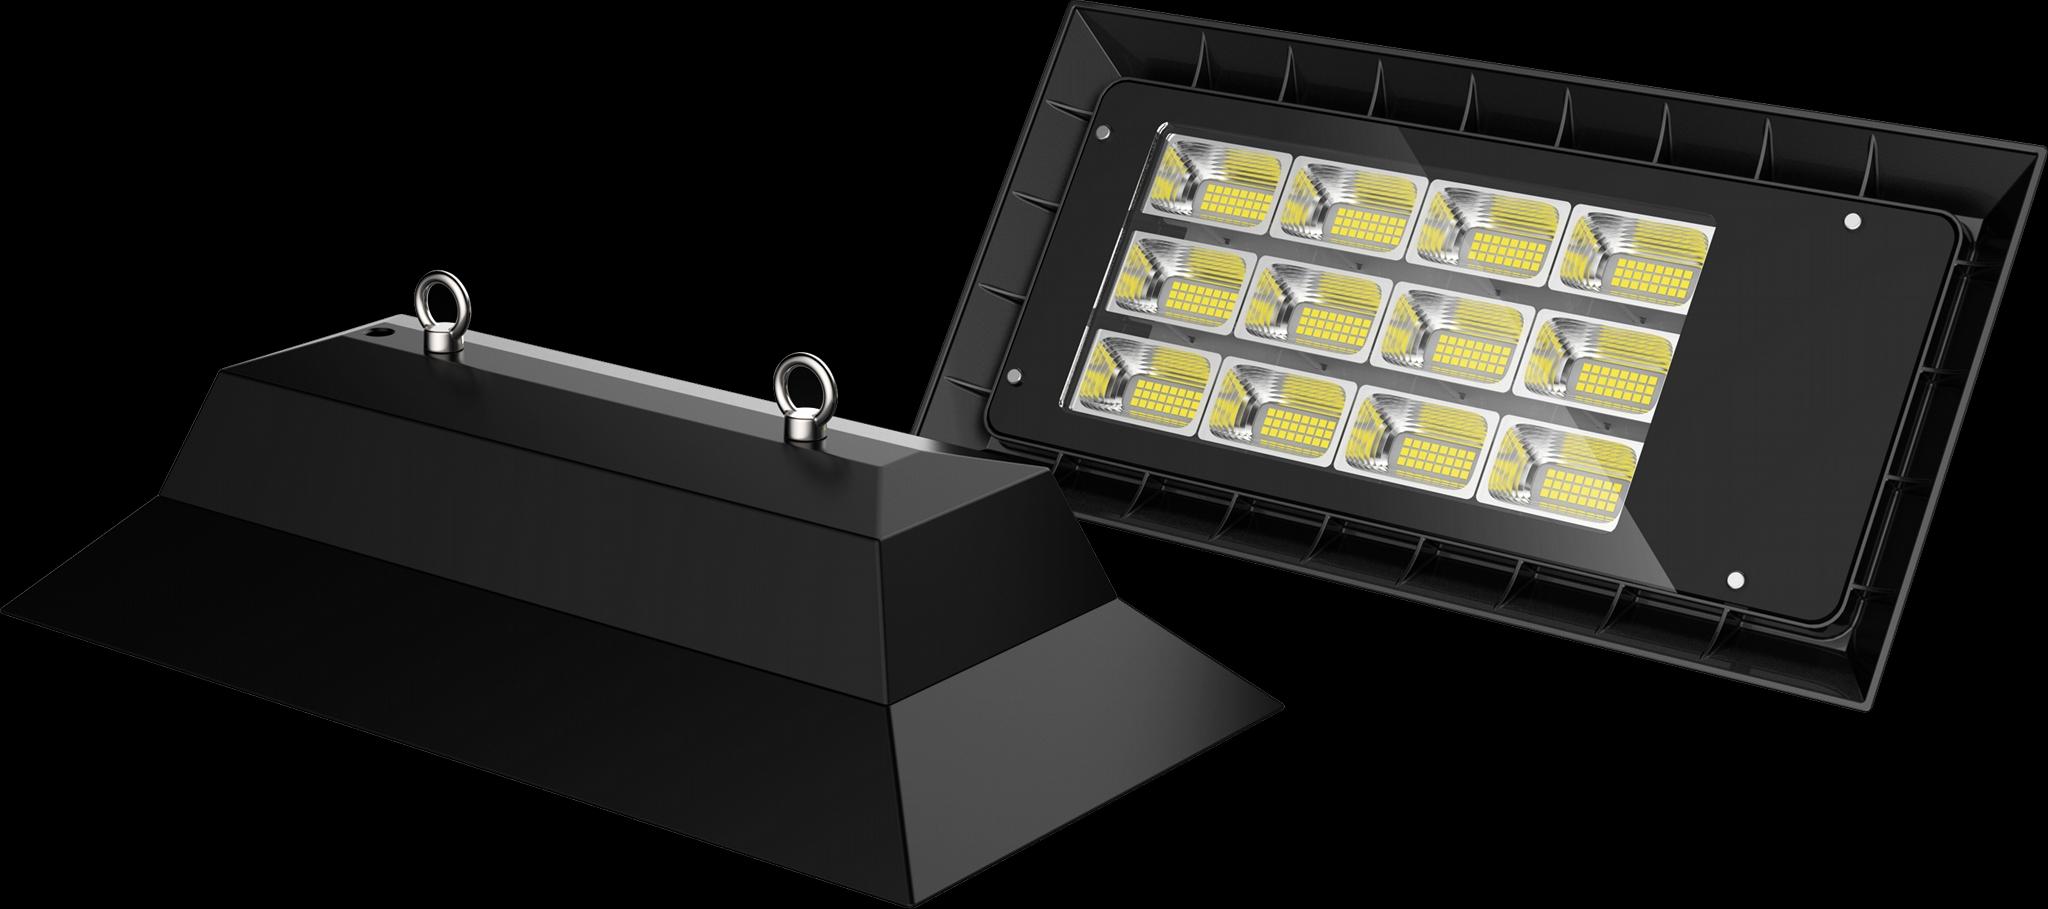 Roof  LED High Bay Light led flood light 80w/100w/150w 5 years warranty 4